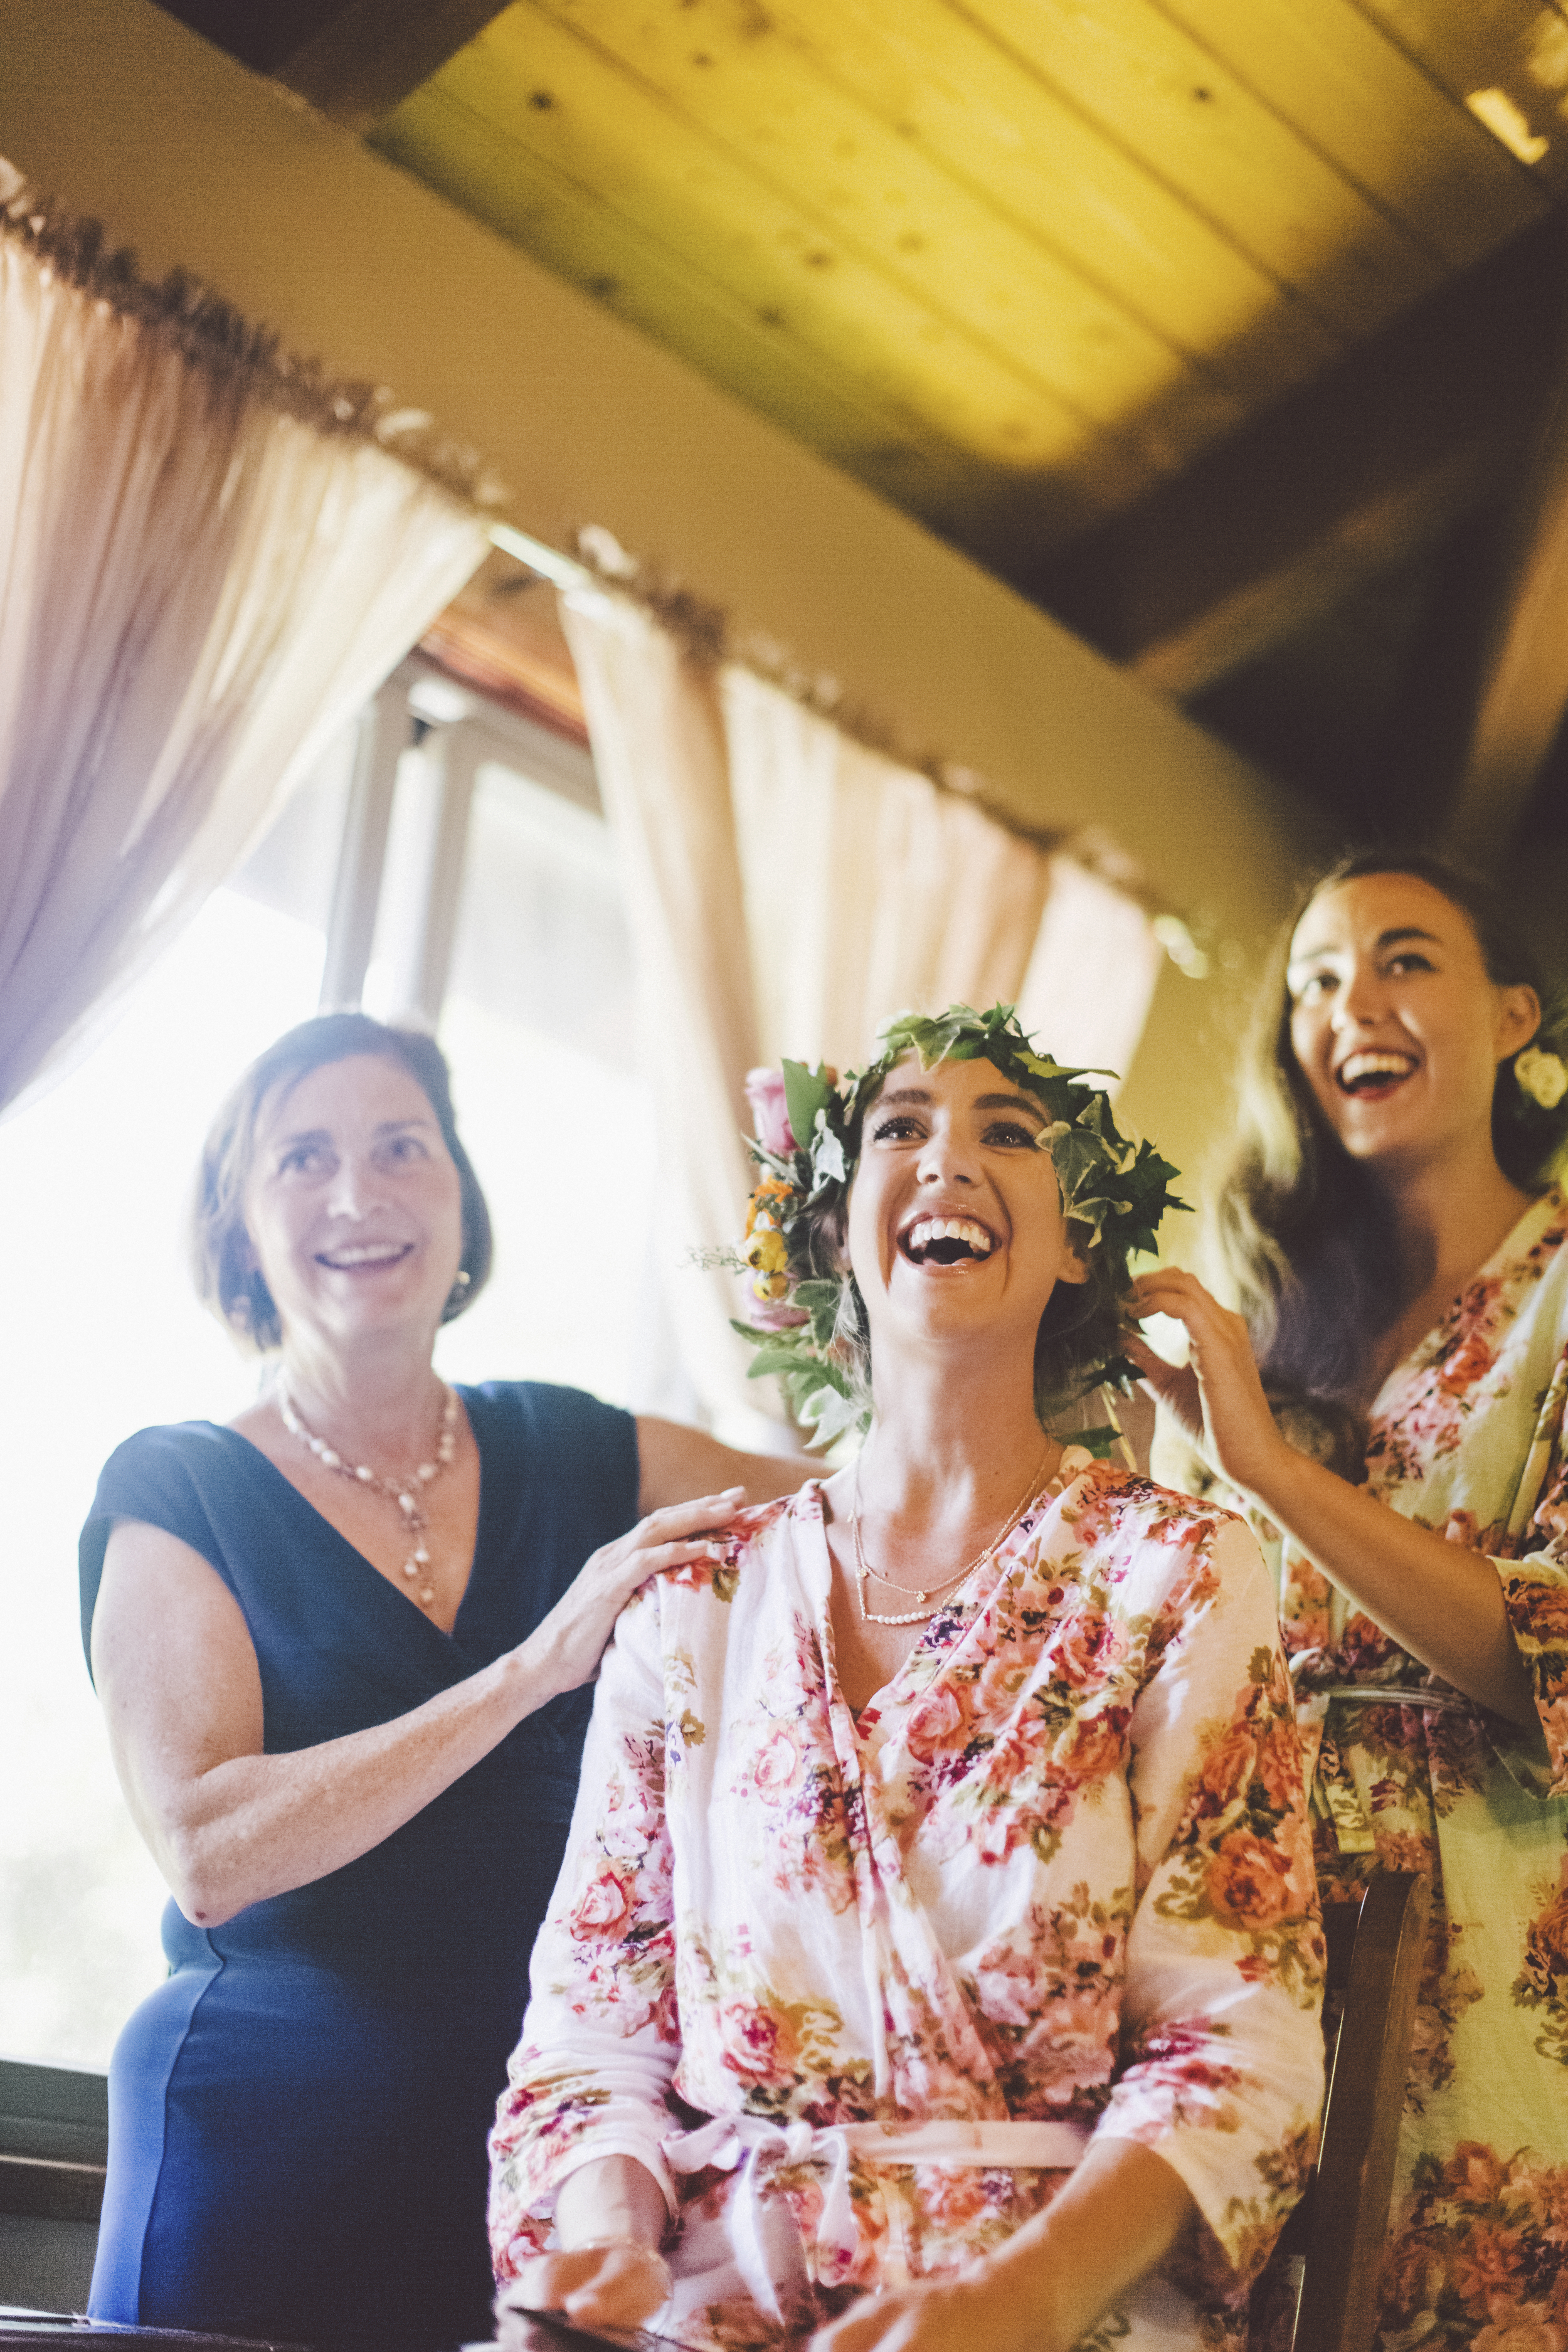 angie-diaz-photography-oahu-hawaii-wedding-tradewinds-ranch-13.jpg